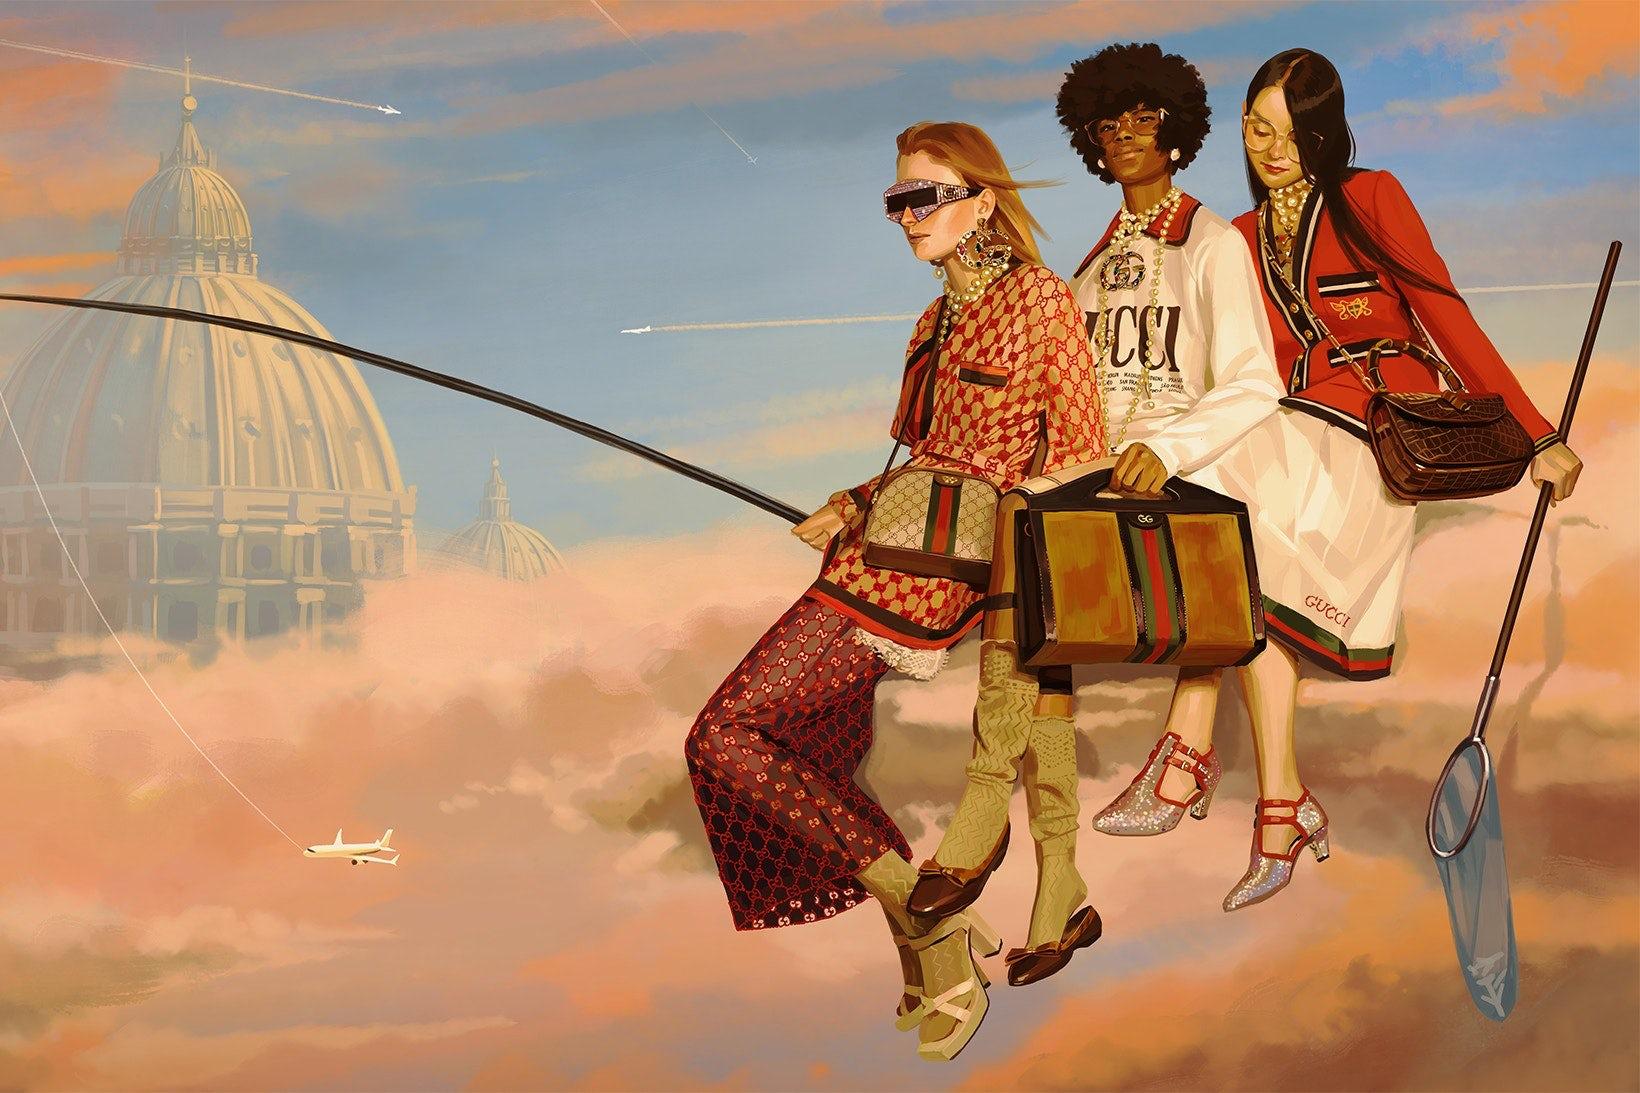 Gucci Spring/Summer 2018 | Illustration by Ignasi Moreal